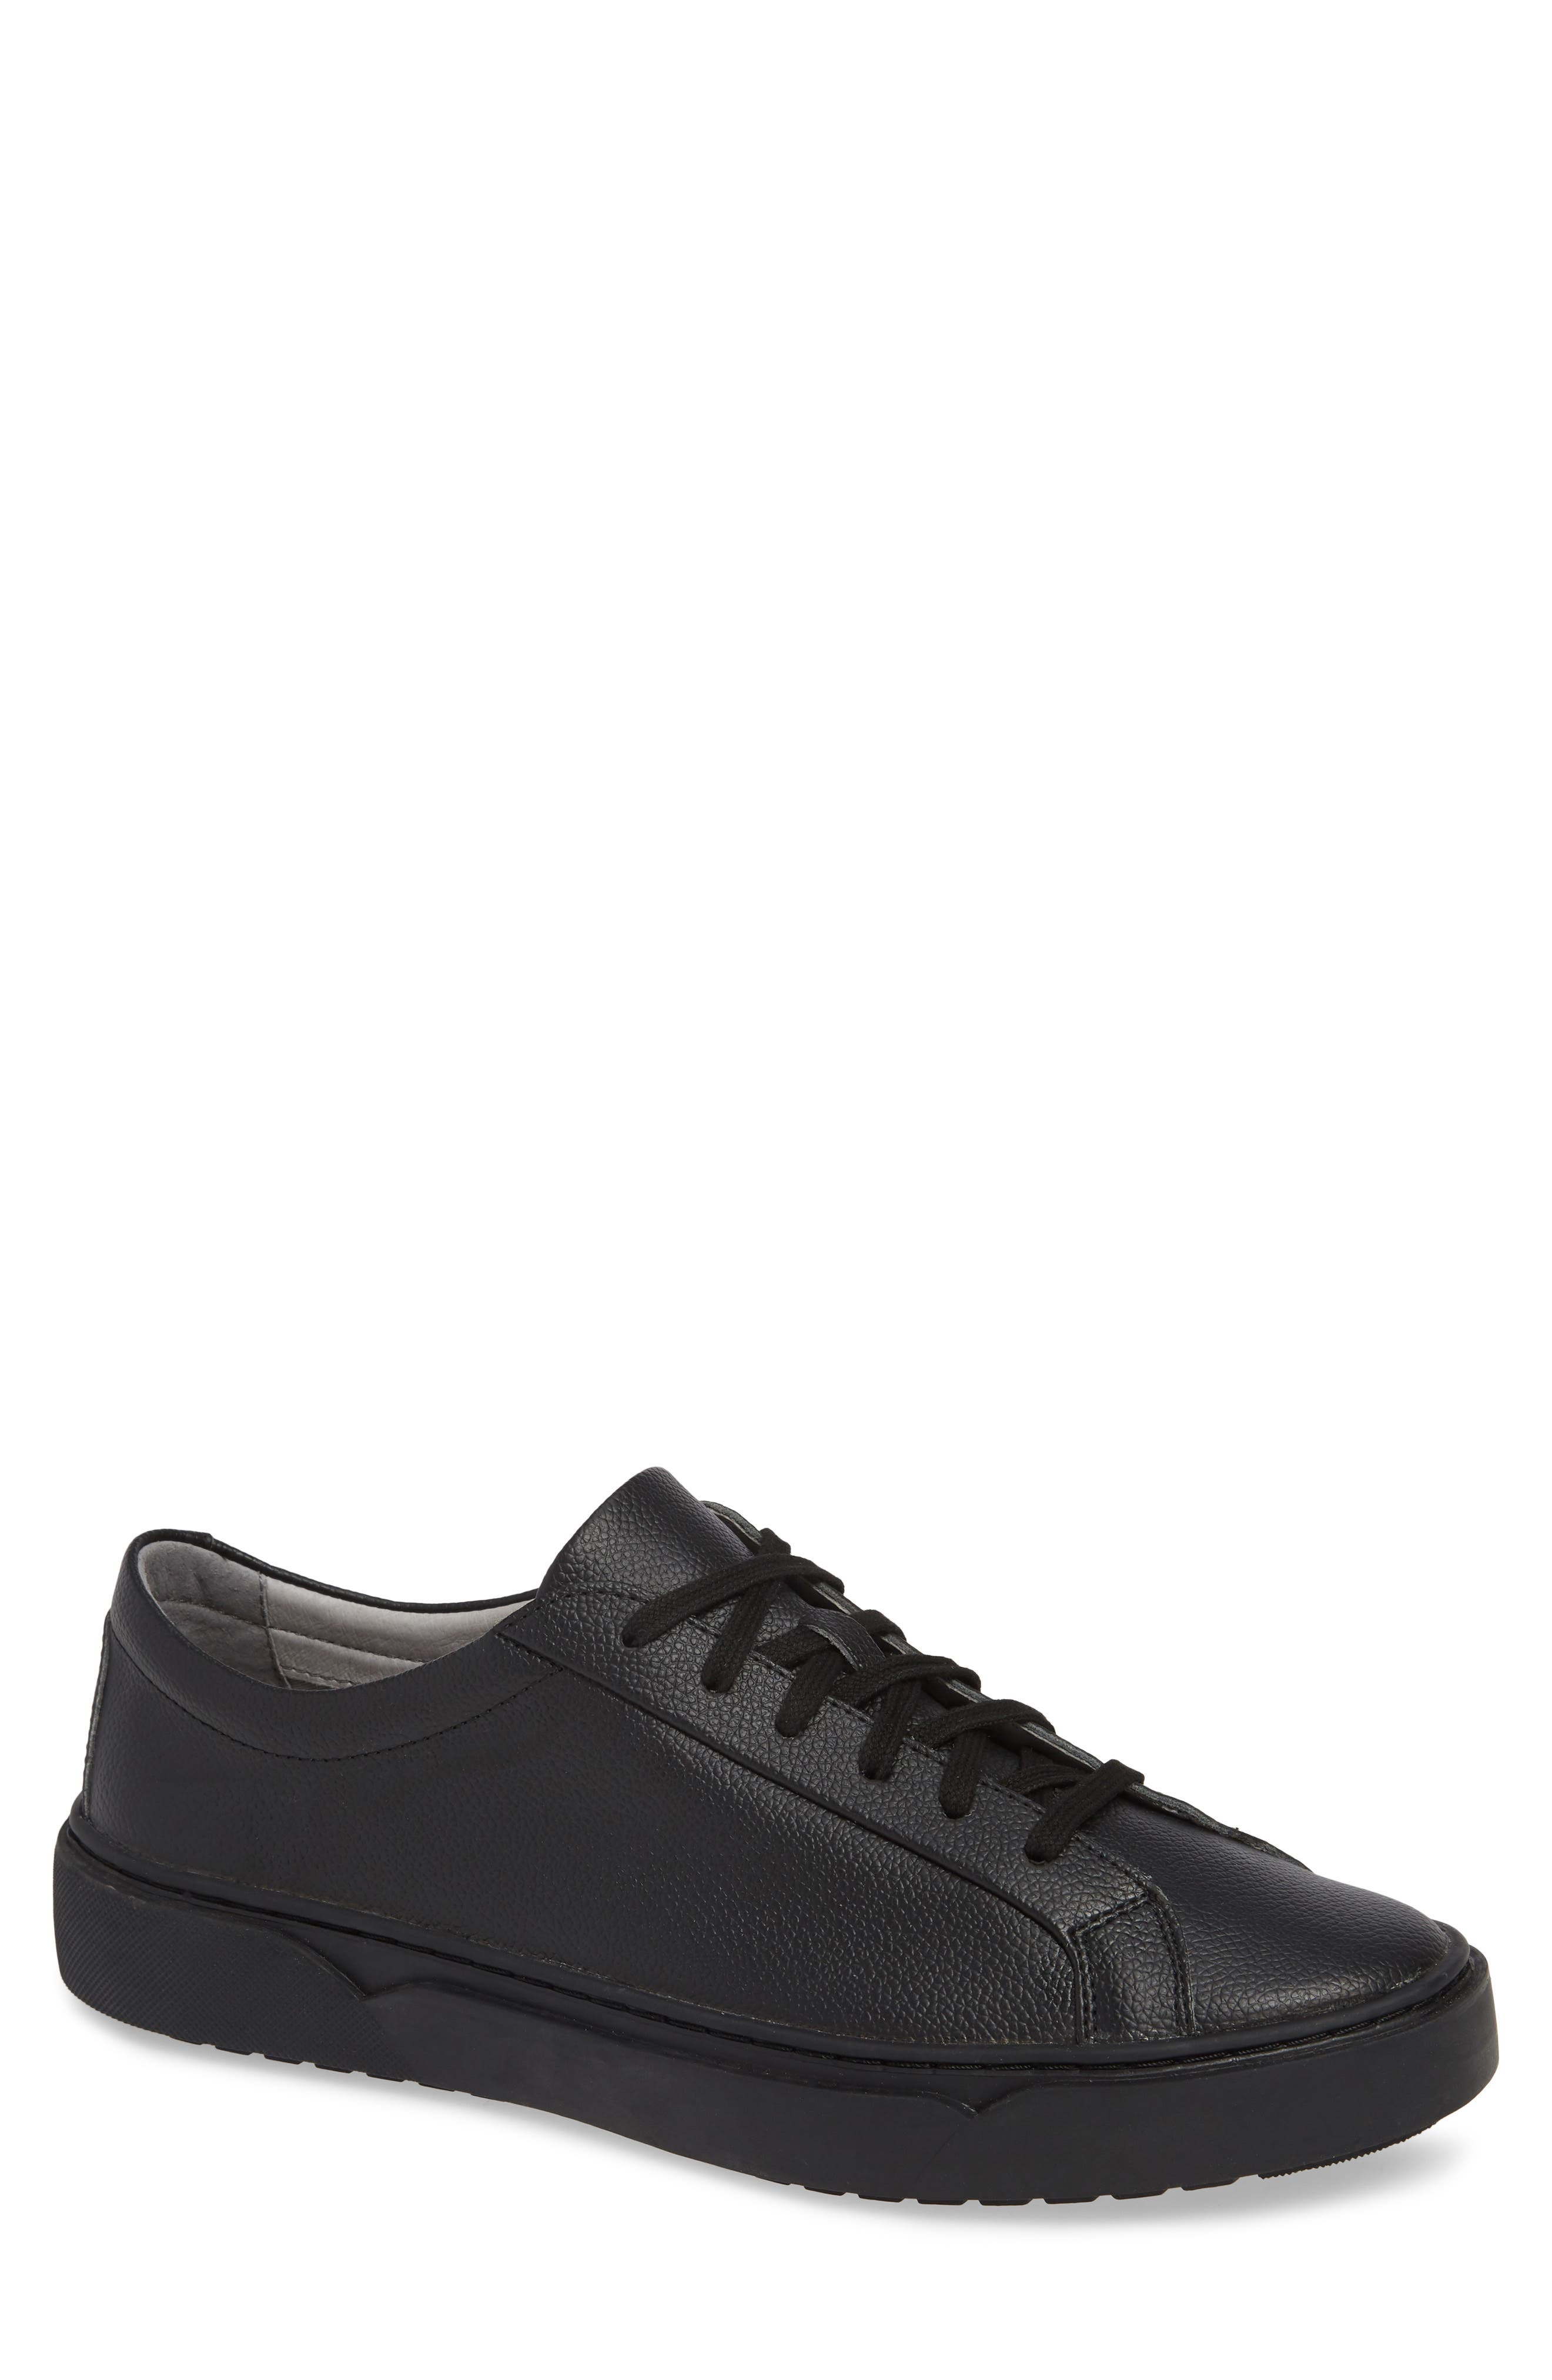 Ken Sneaker,                         Main,                         color, TRIPLE BLACK LEATHER